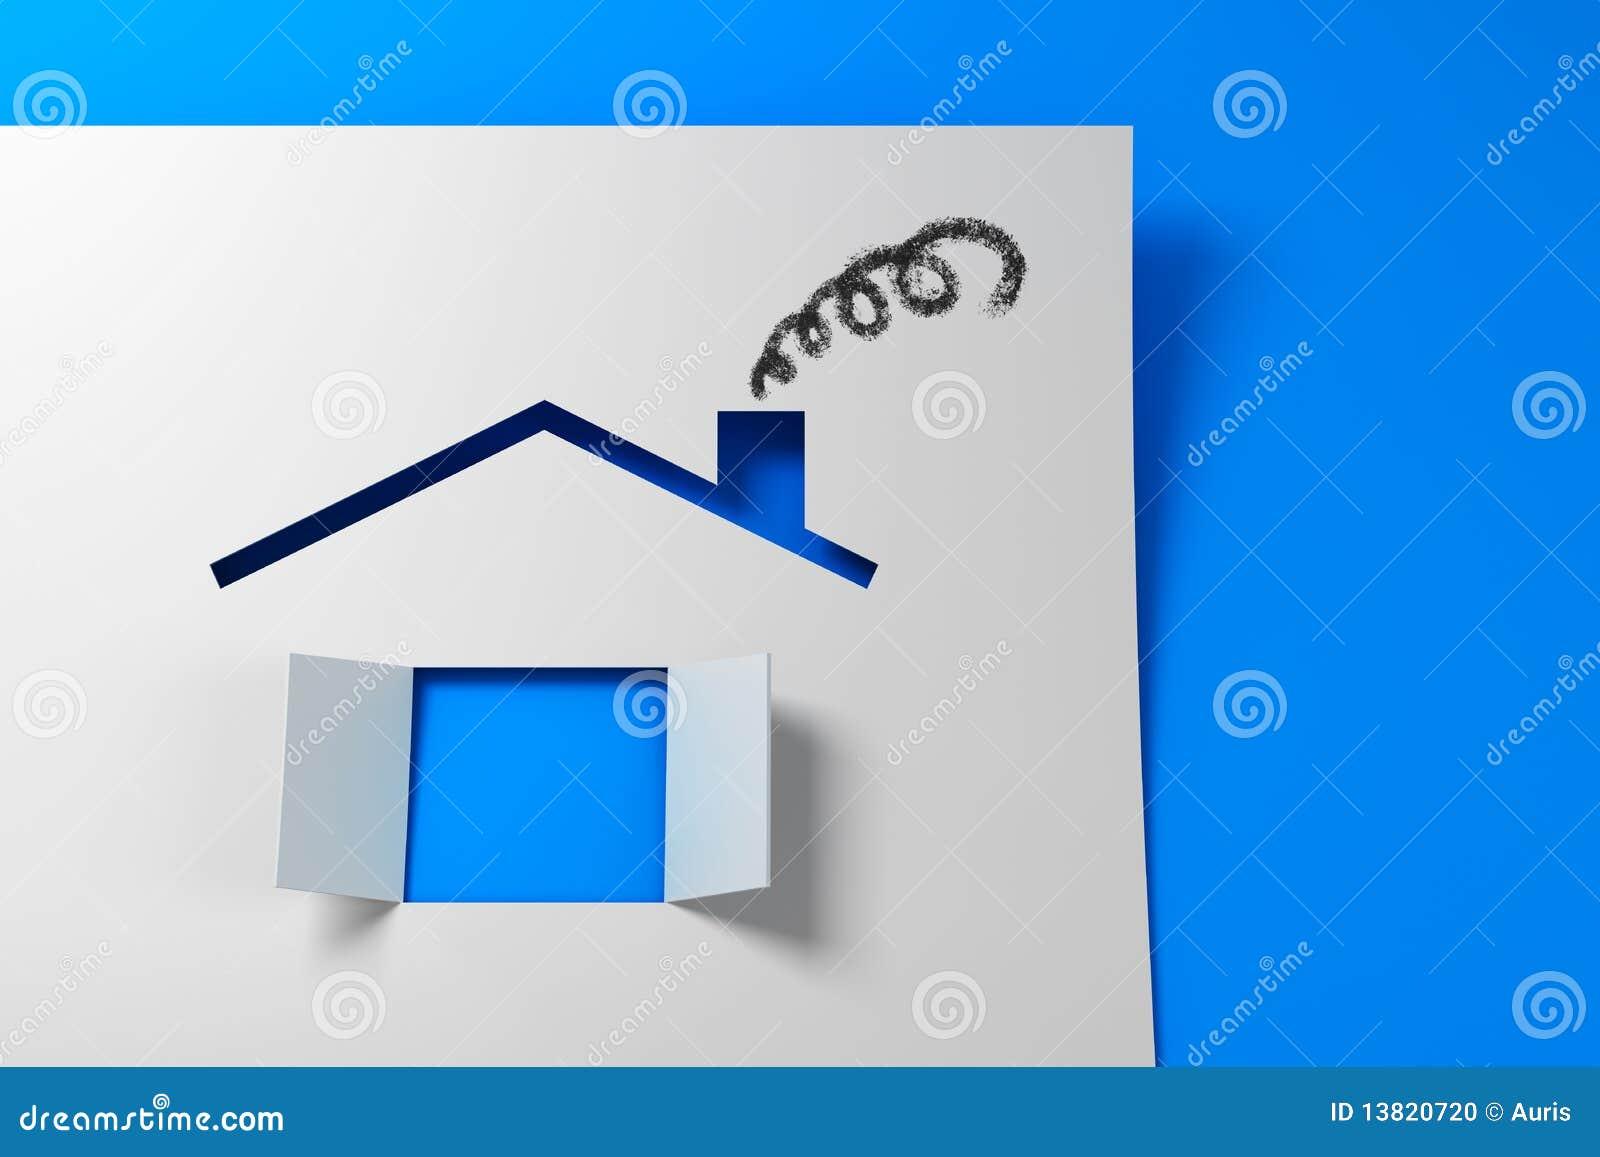 Symbolic Paper House 3d Stock Photo Image 13820720